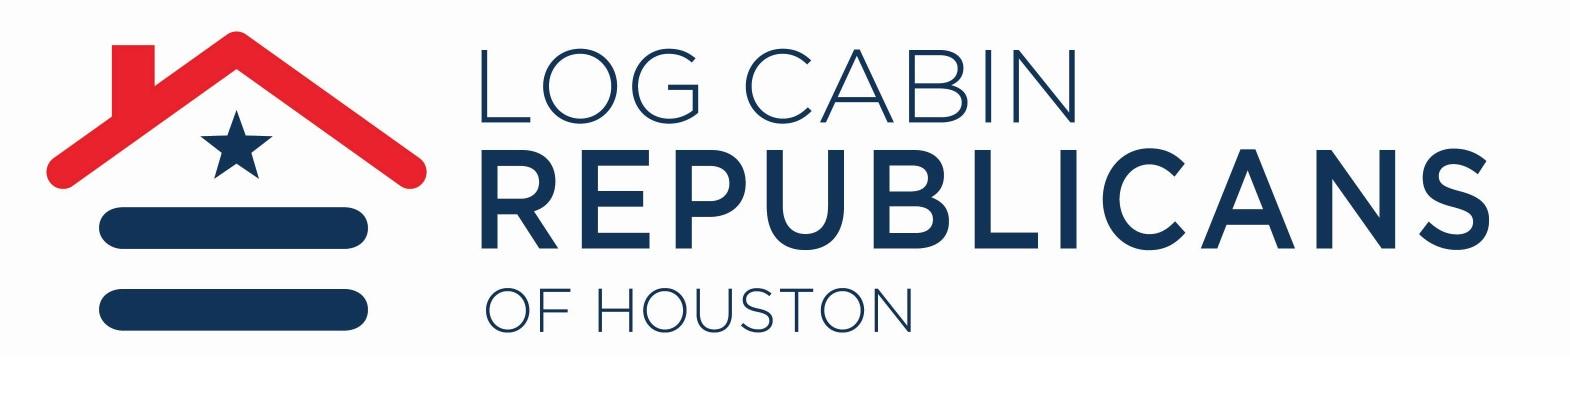 Log Cabin Republicans logo